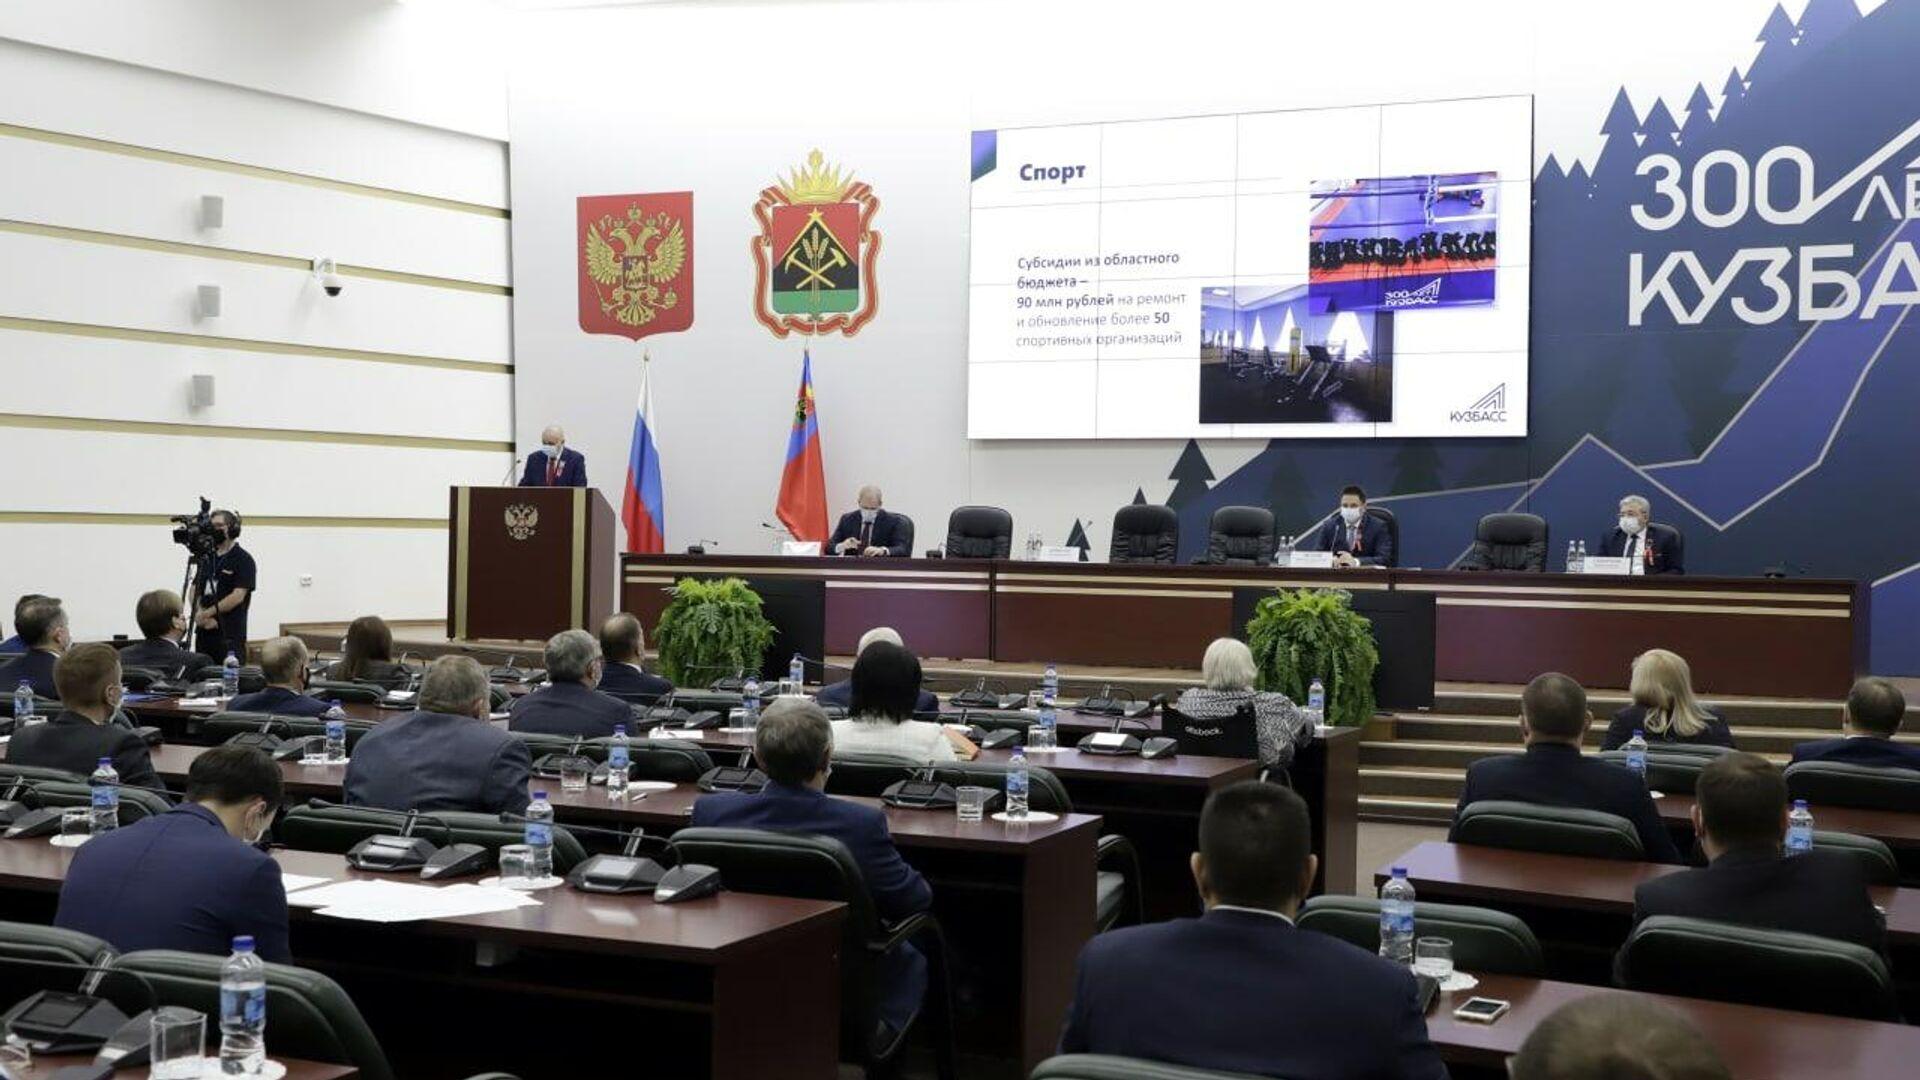 Депутаты на заседании парламента Кузбасса - РИА Новости, 1920, 21.12.2020